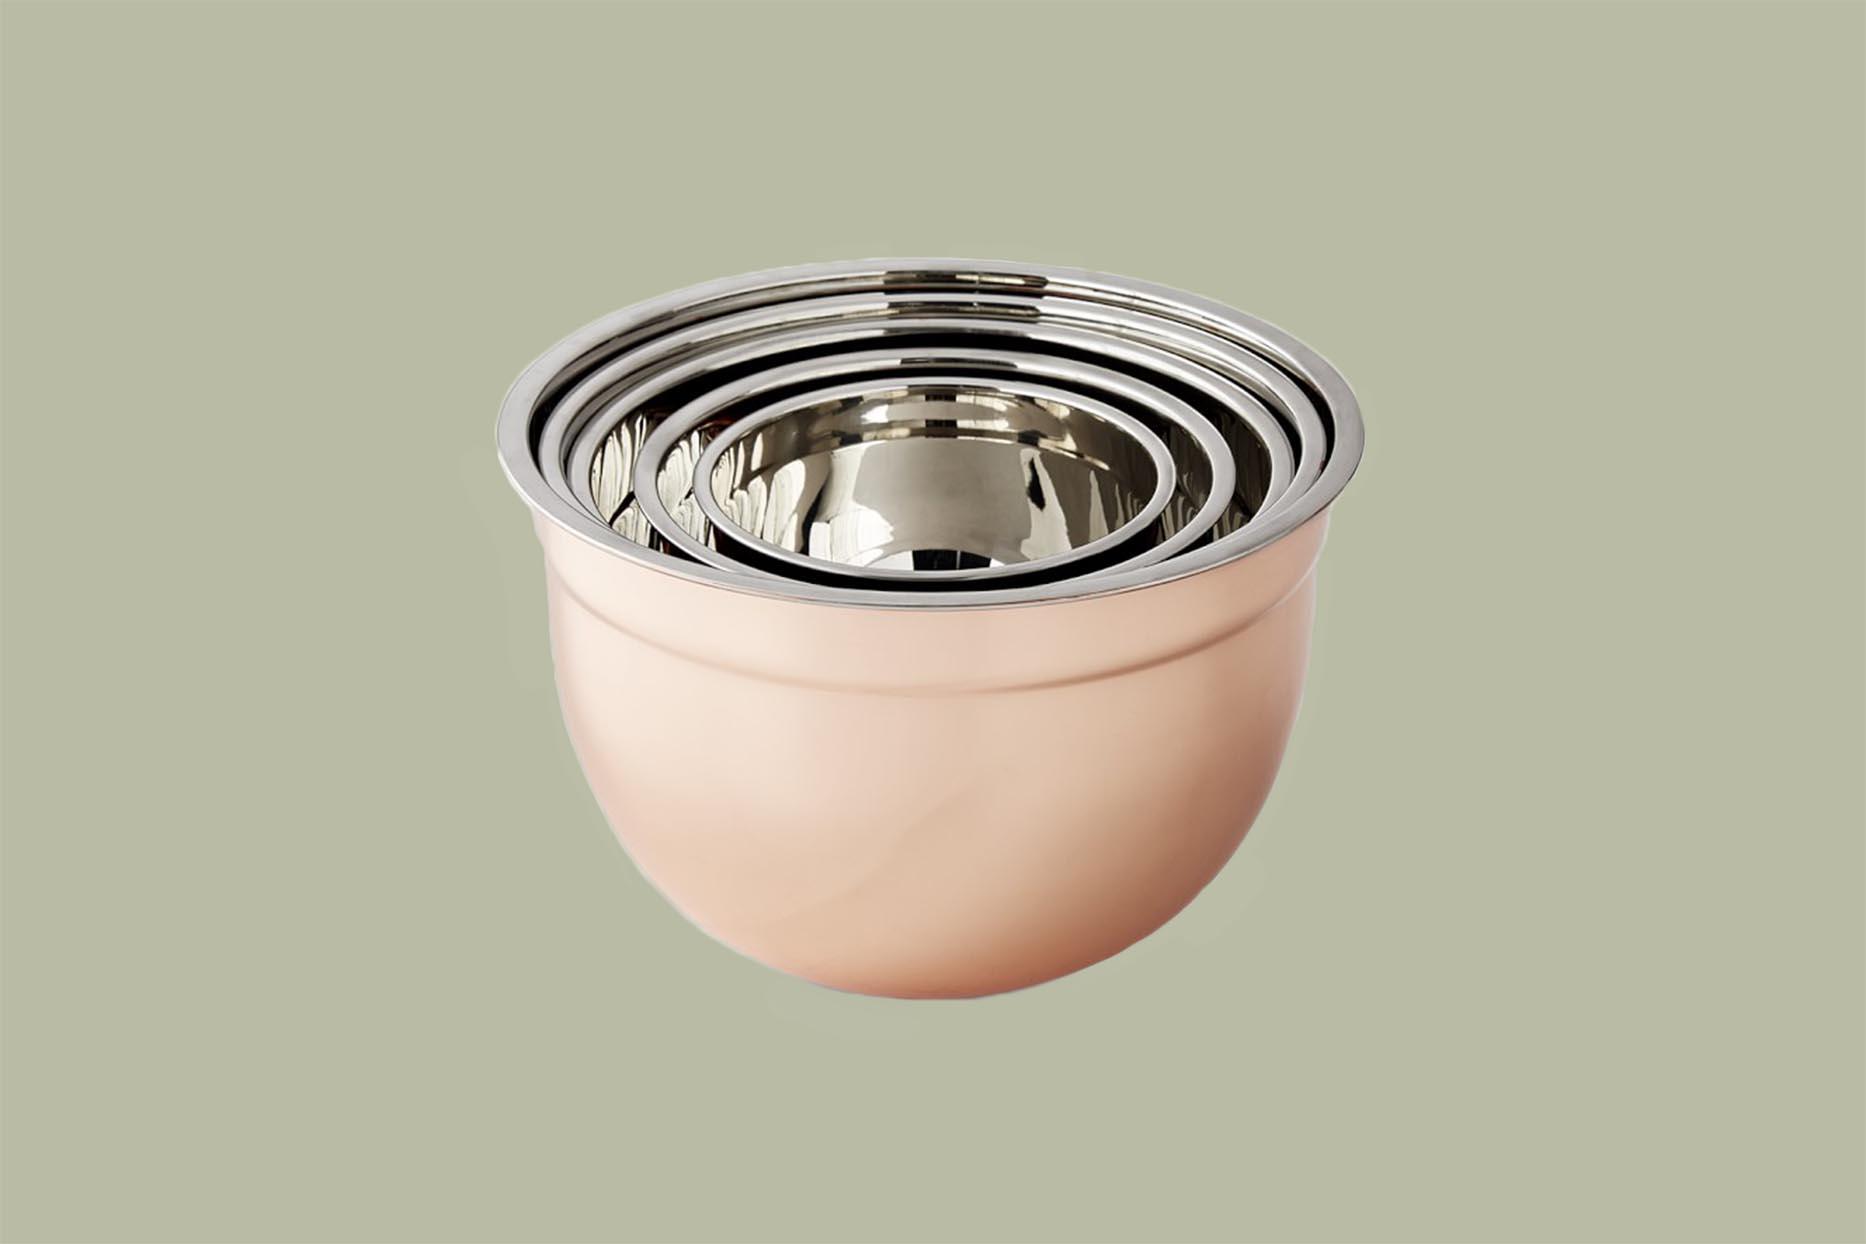 Williams-Sonoma Copper Mixing Bowls